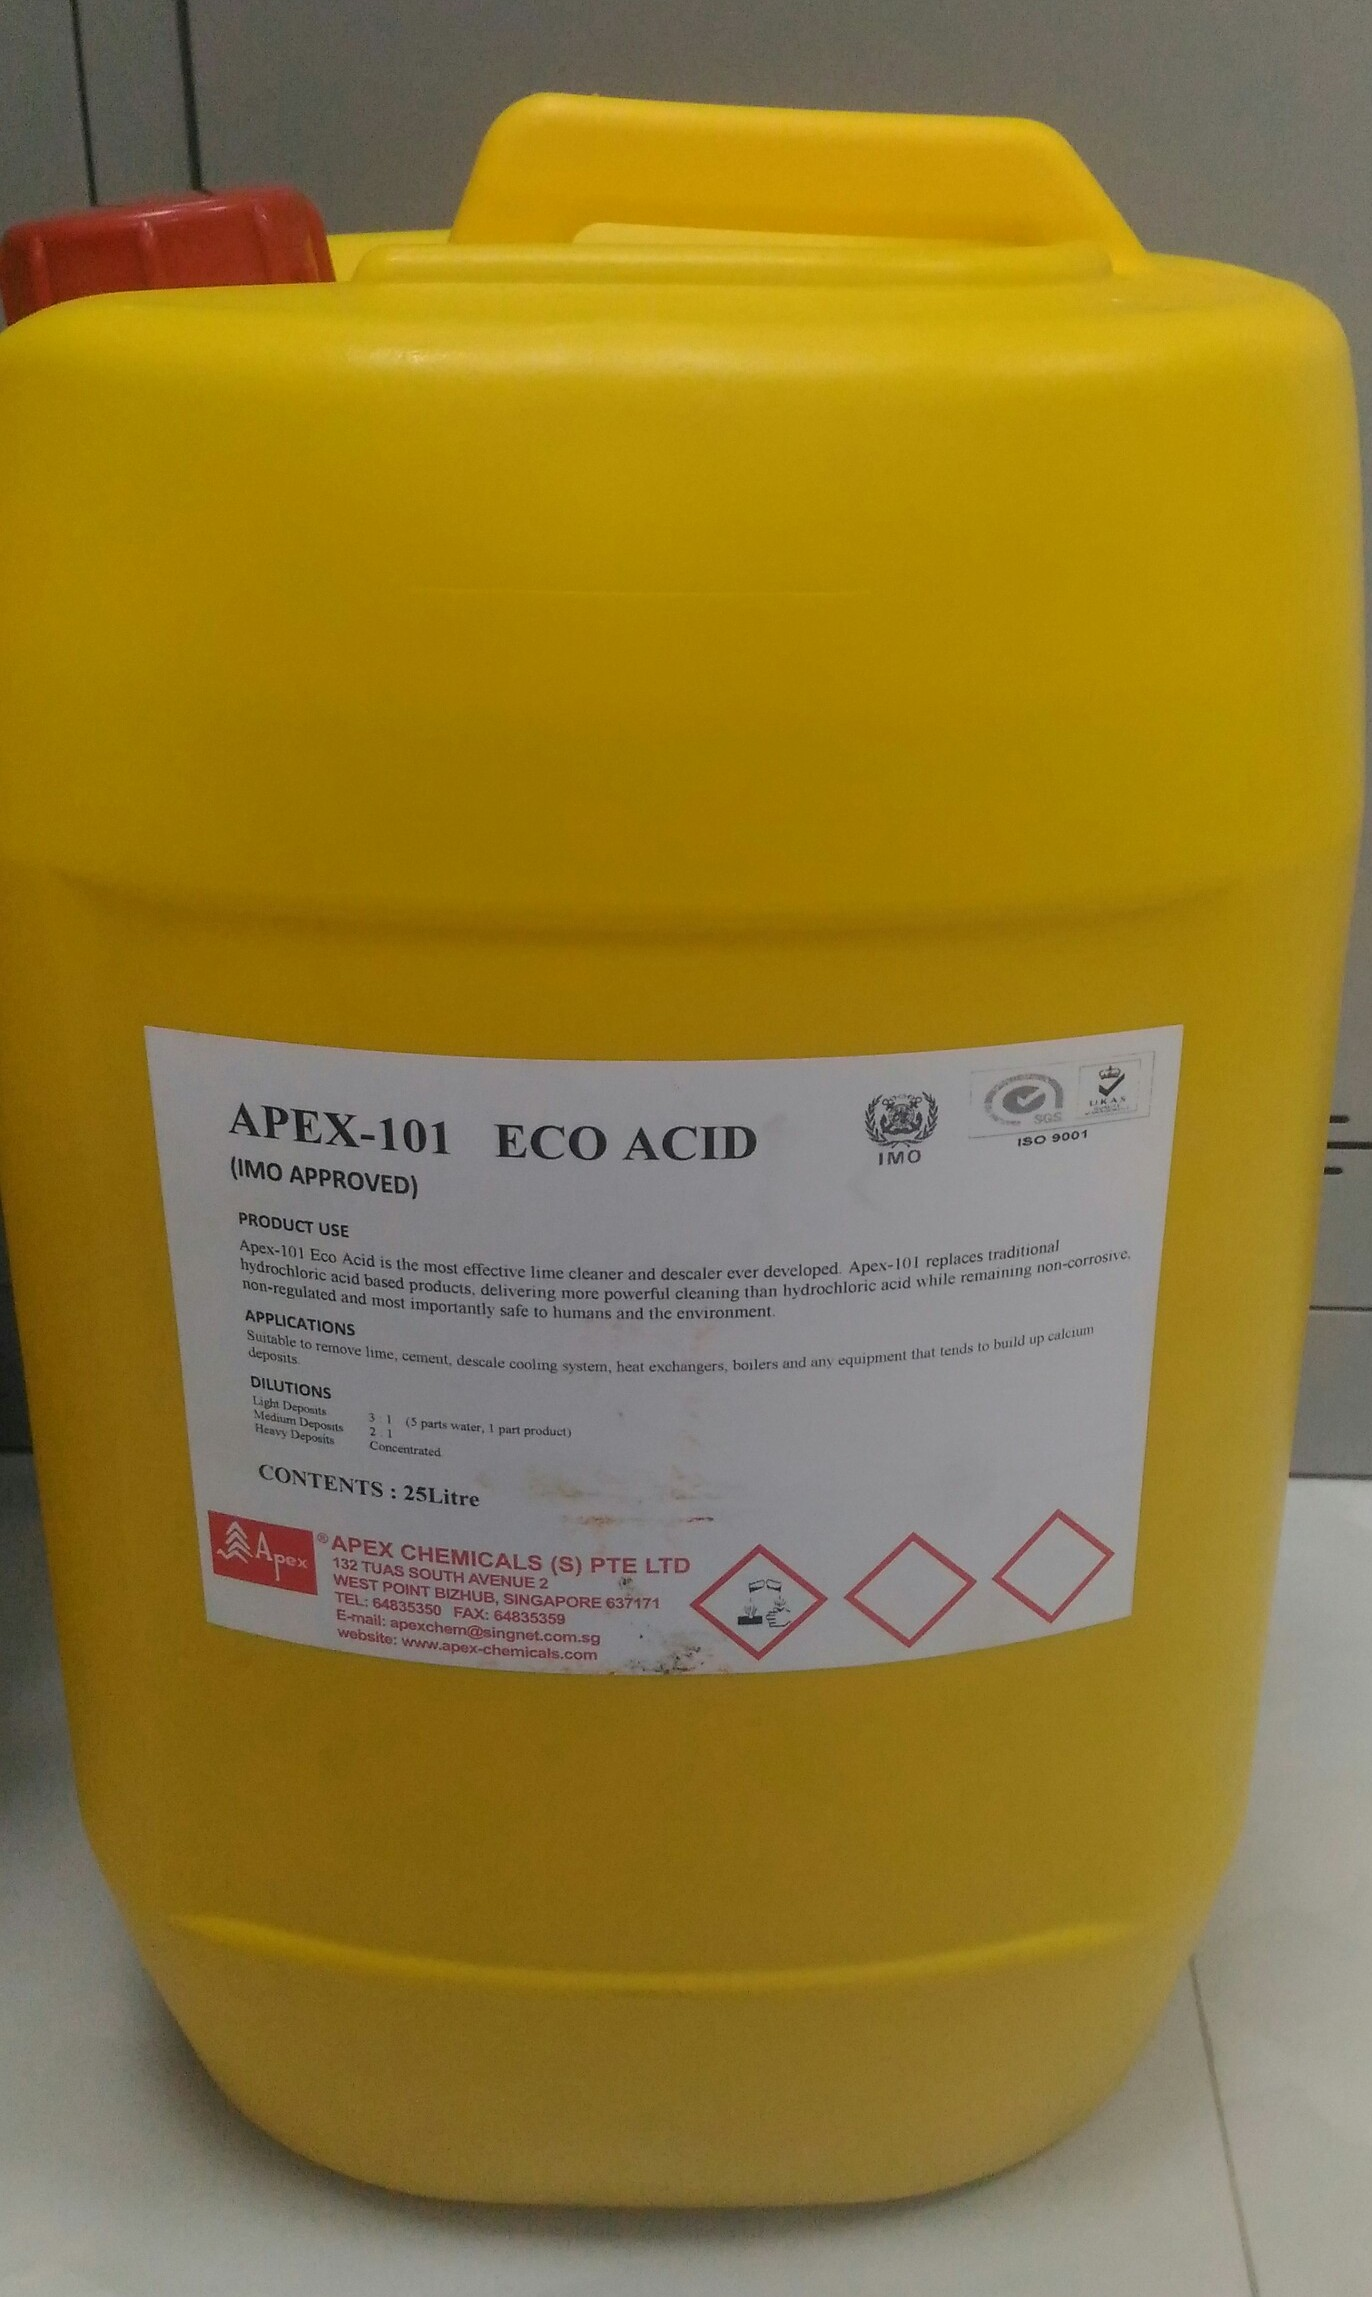 APEX-101 ECO ACID